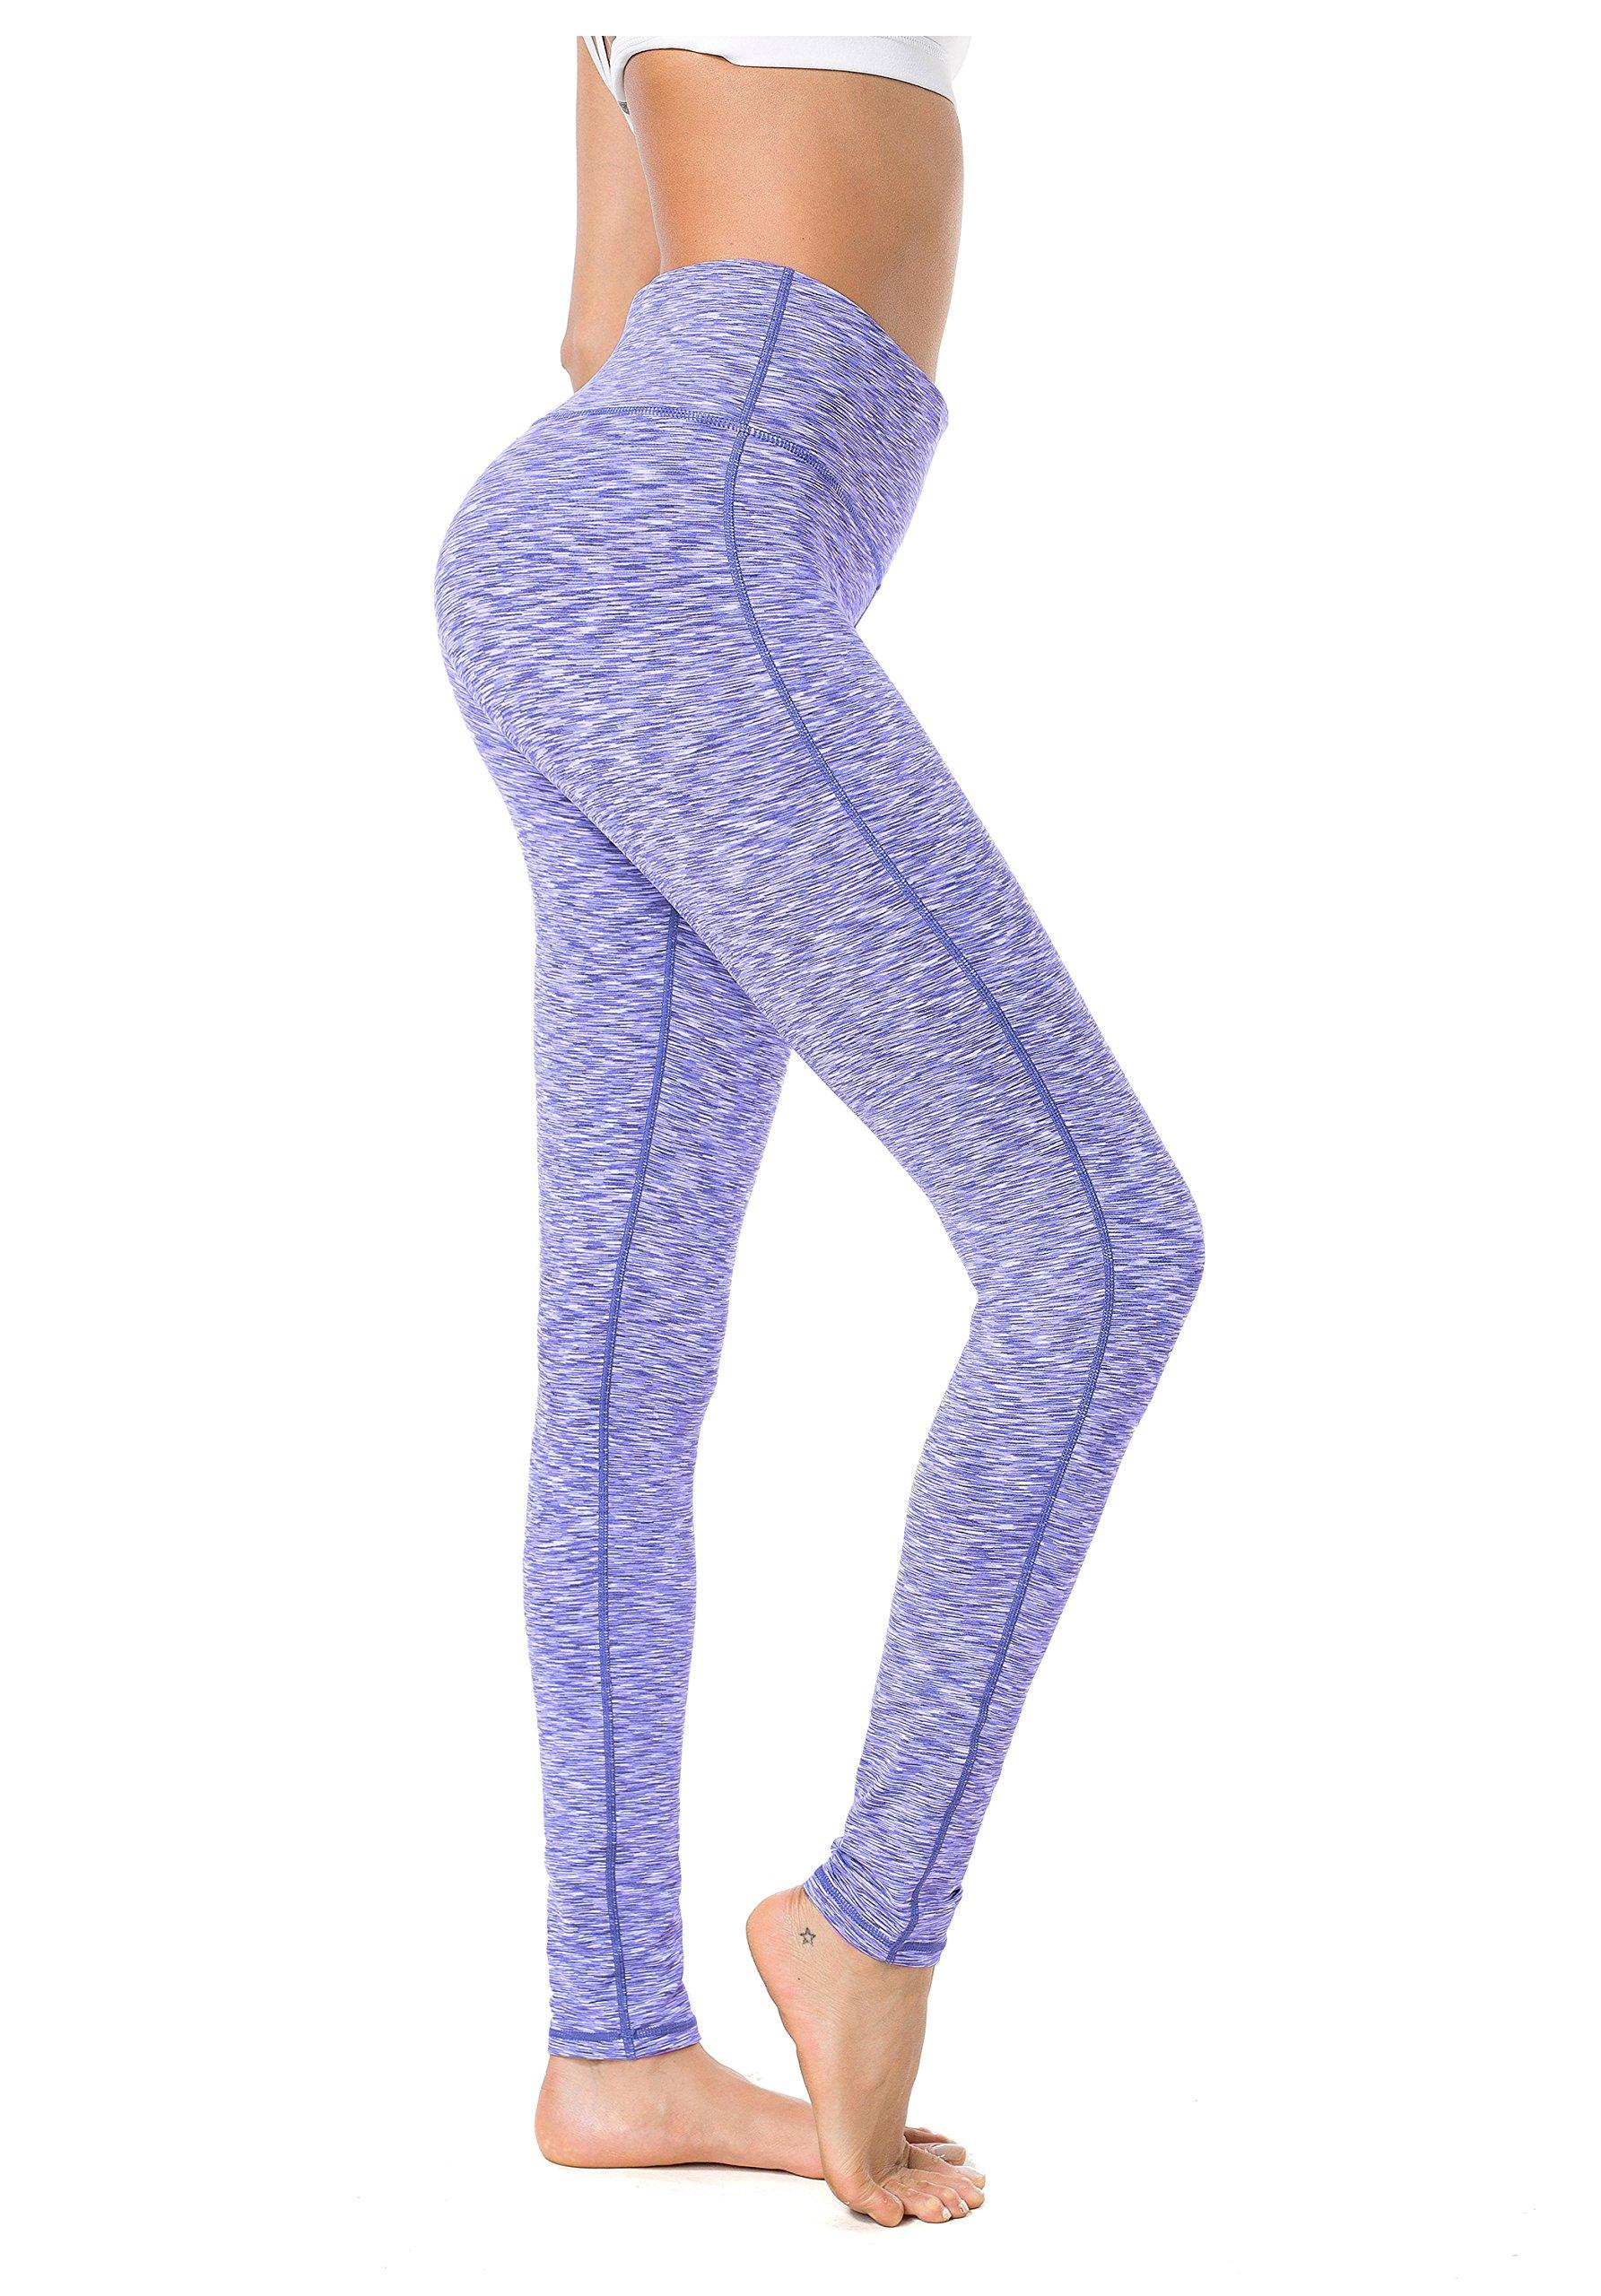 Queenie Ke Women Mid-Waist Phone Back Pockets Sport Legging Yoga Pants Running Tights Size XS Color Blue White Space Dye